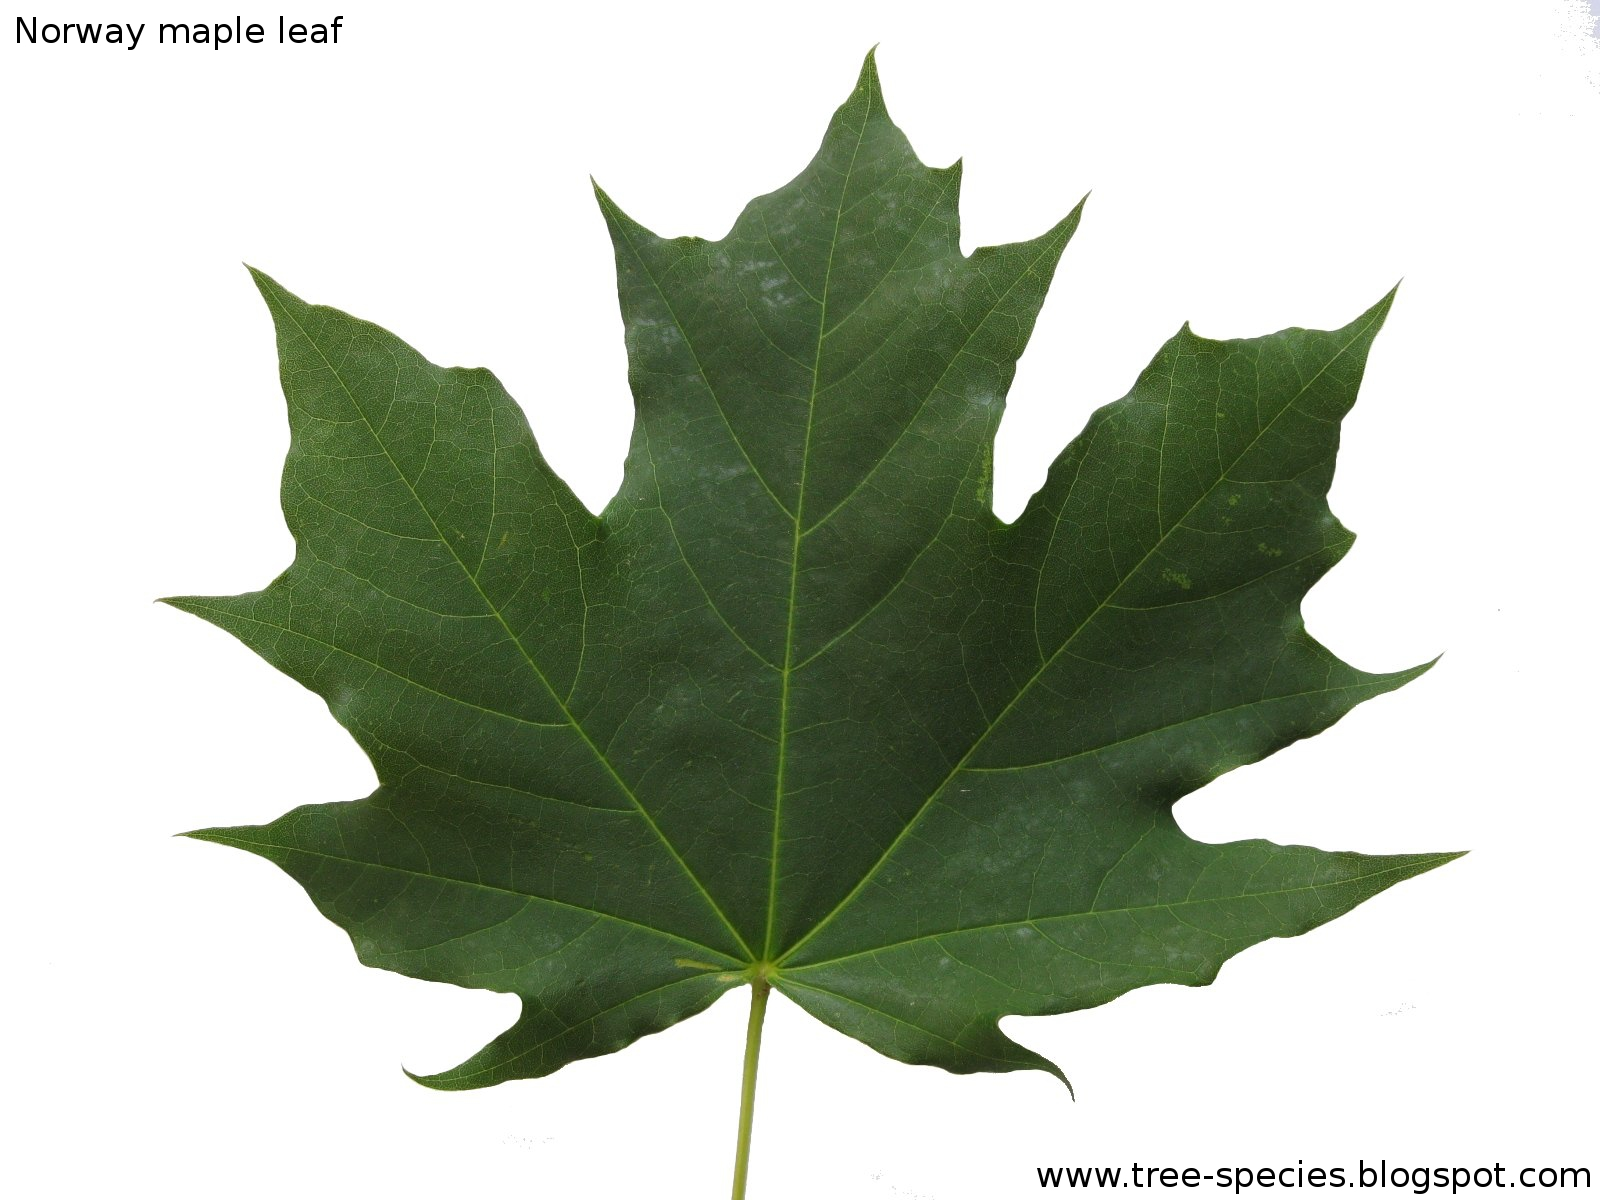 Acer platanoides Norway maple leaf